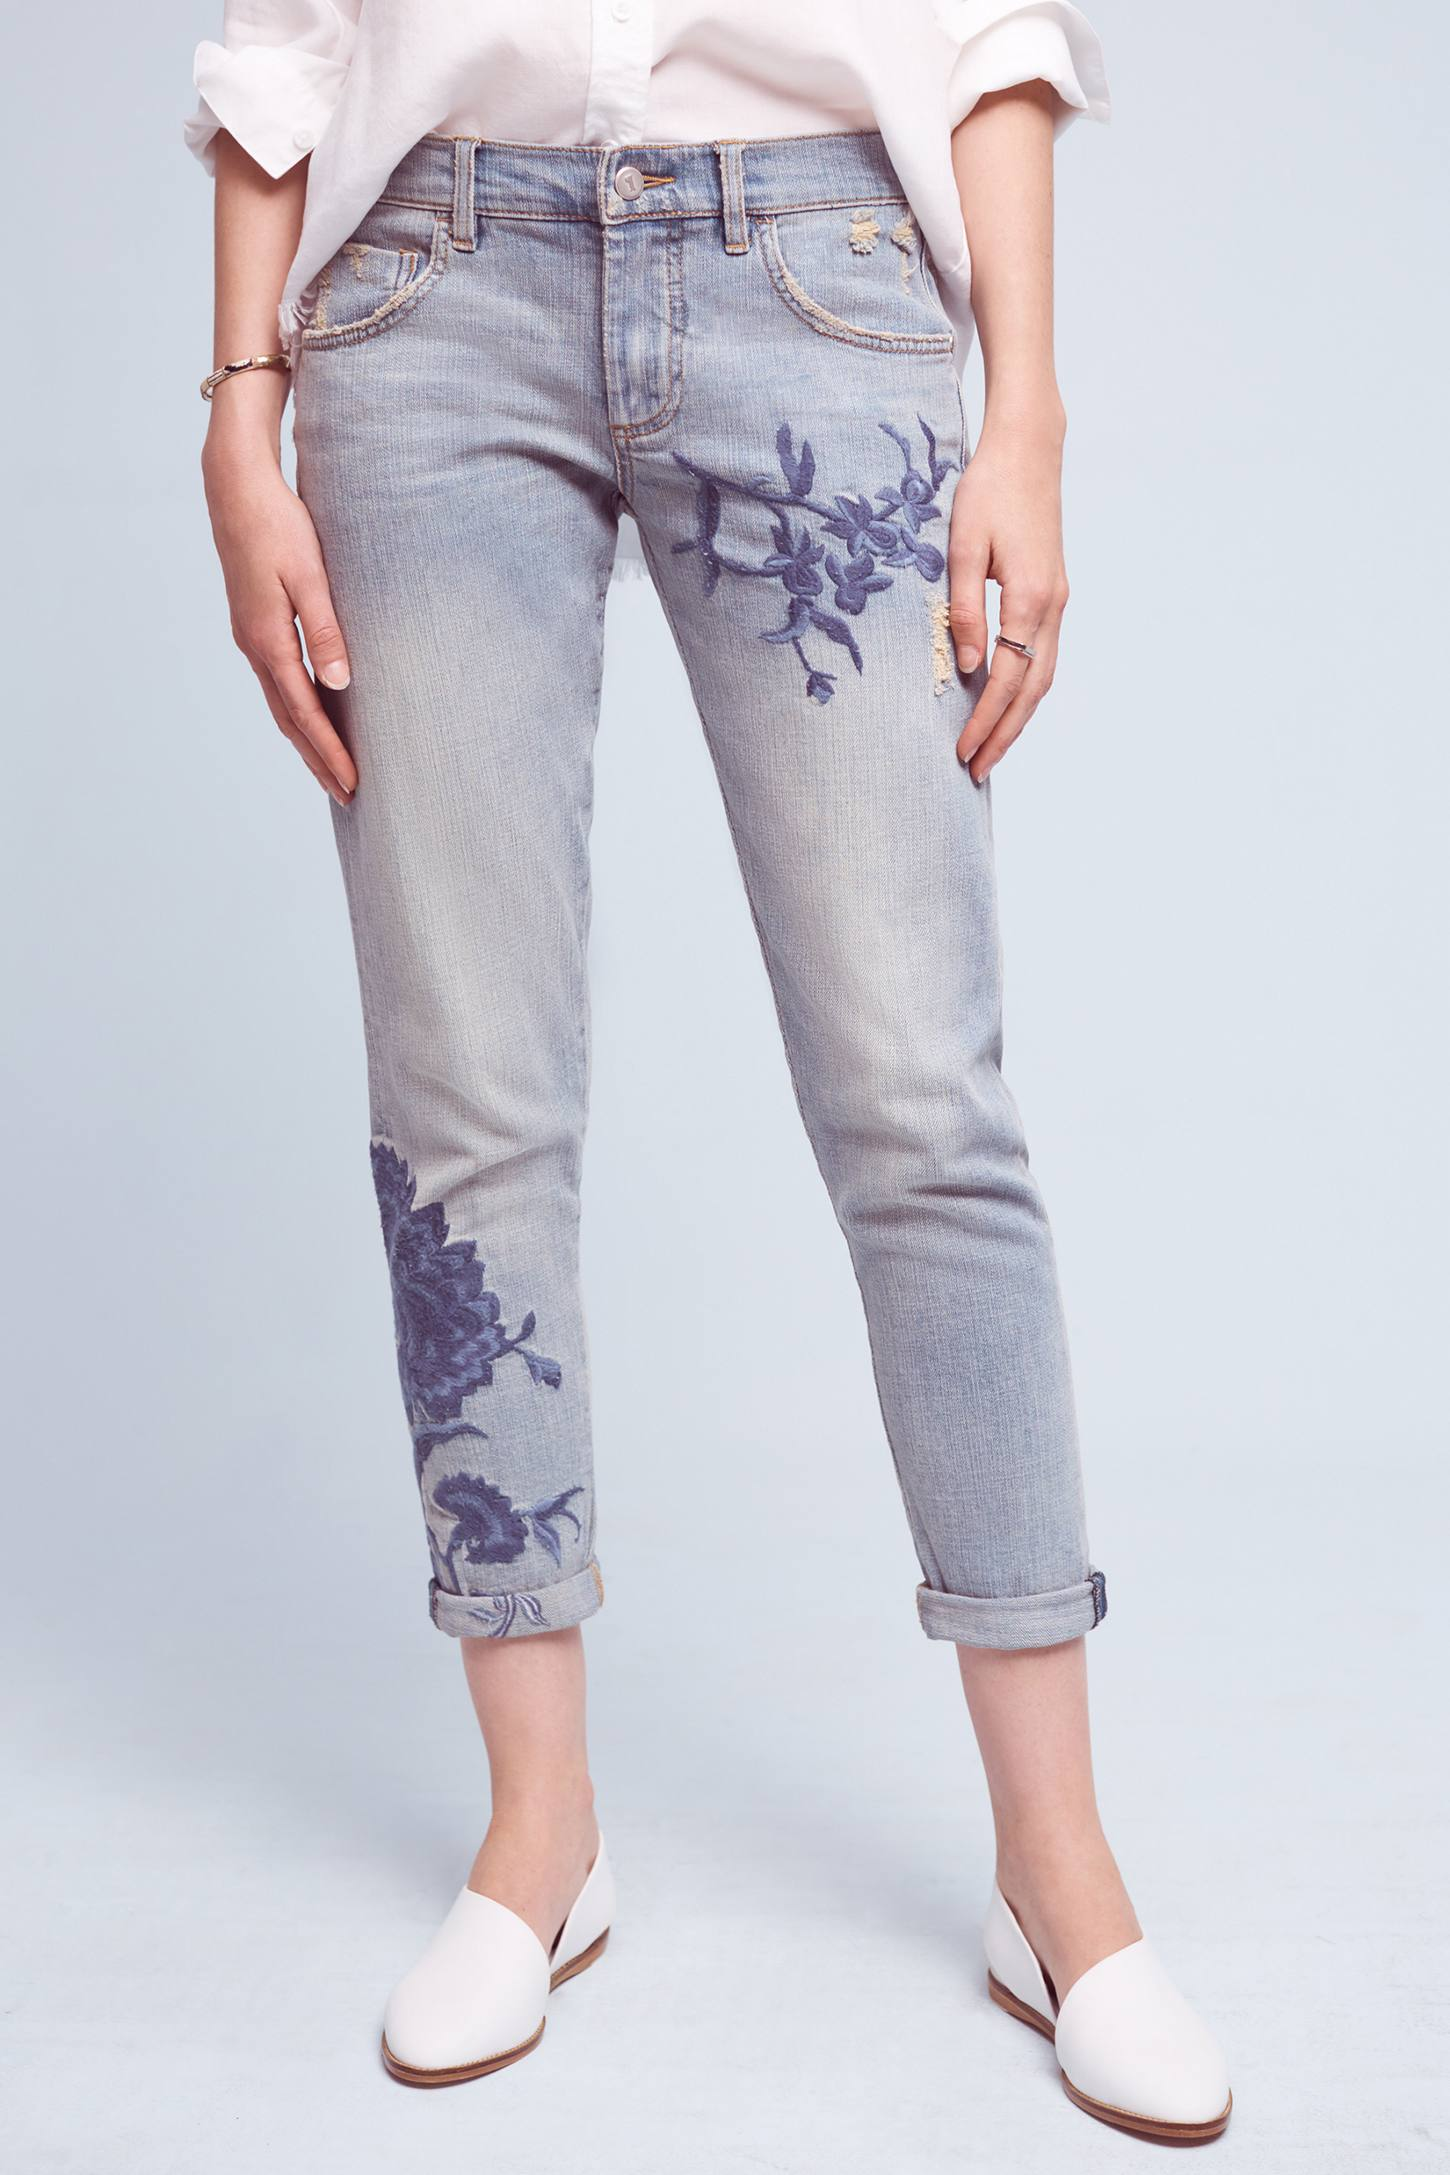 Anthropologie Pilcro Em High-Rise Boyfriend Jeans